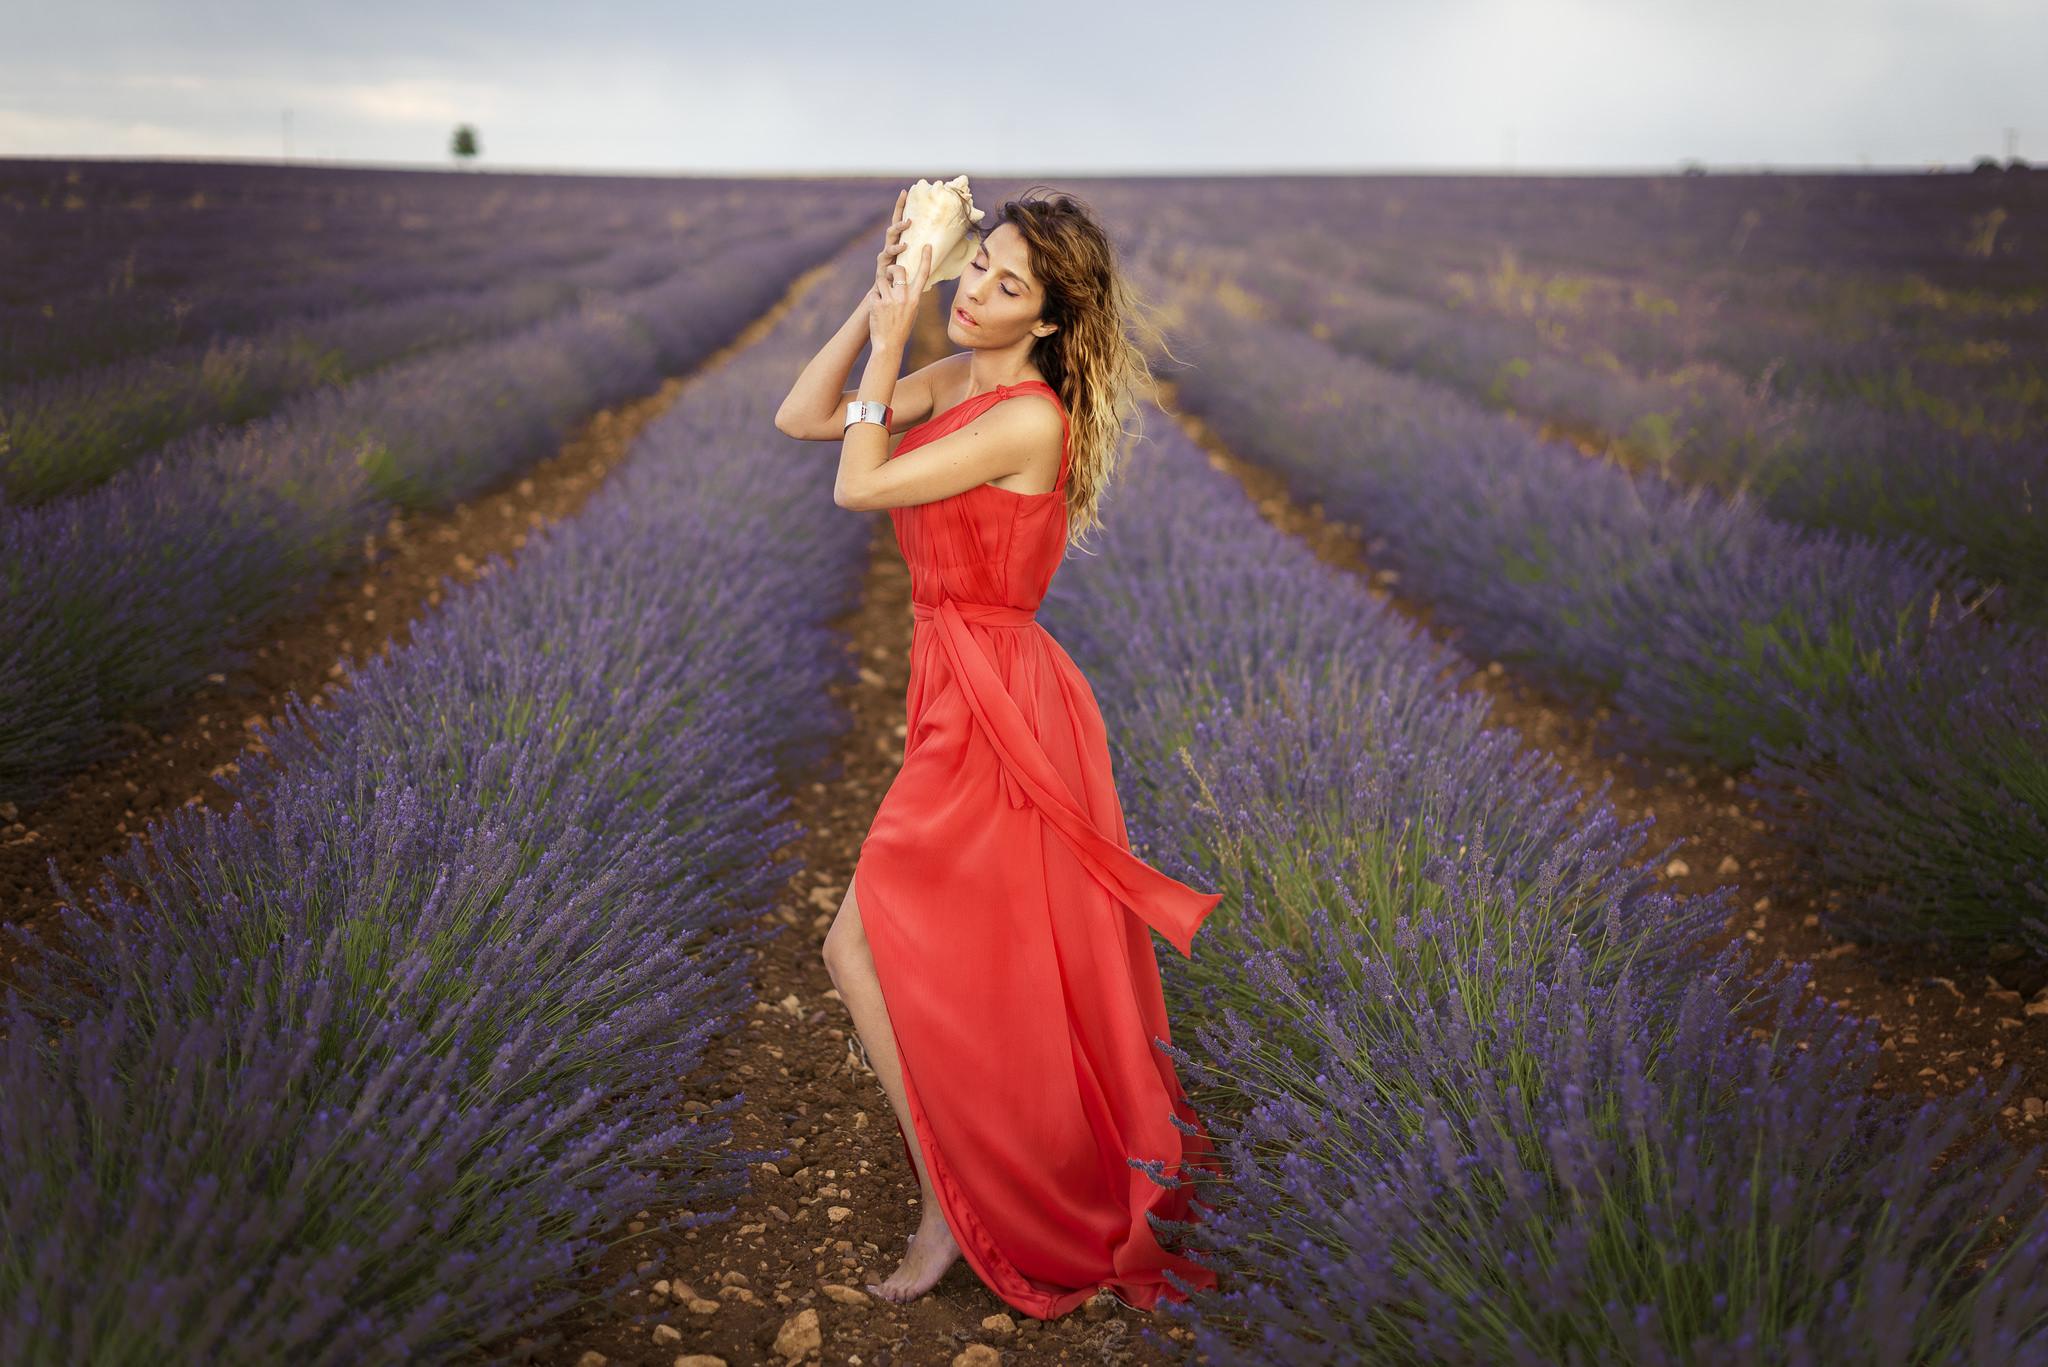 Chicas bellas y paisajes - 2048x1367